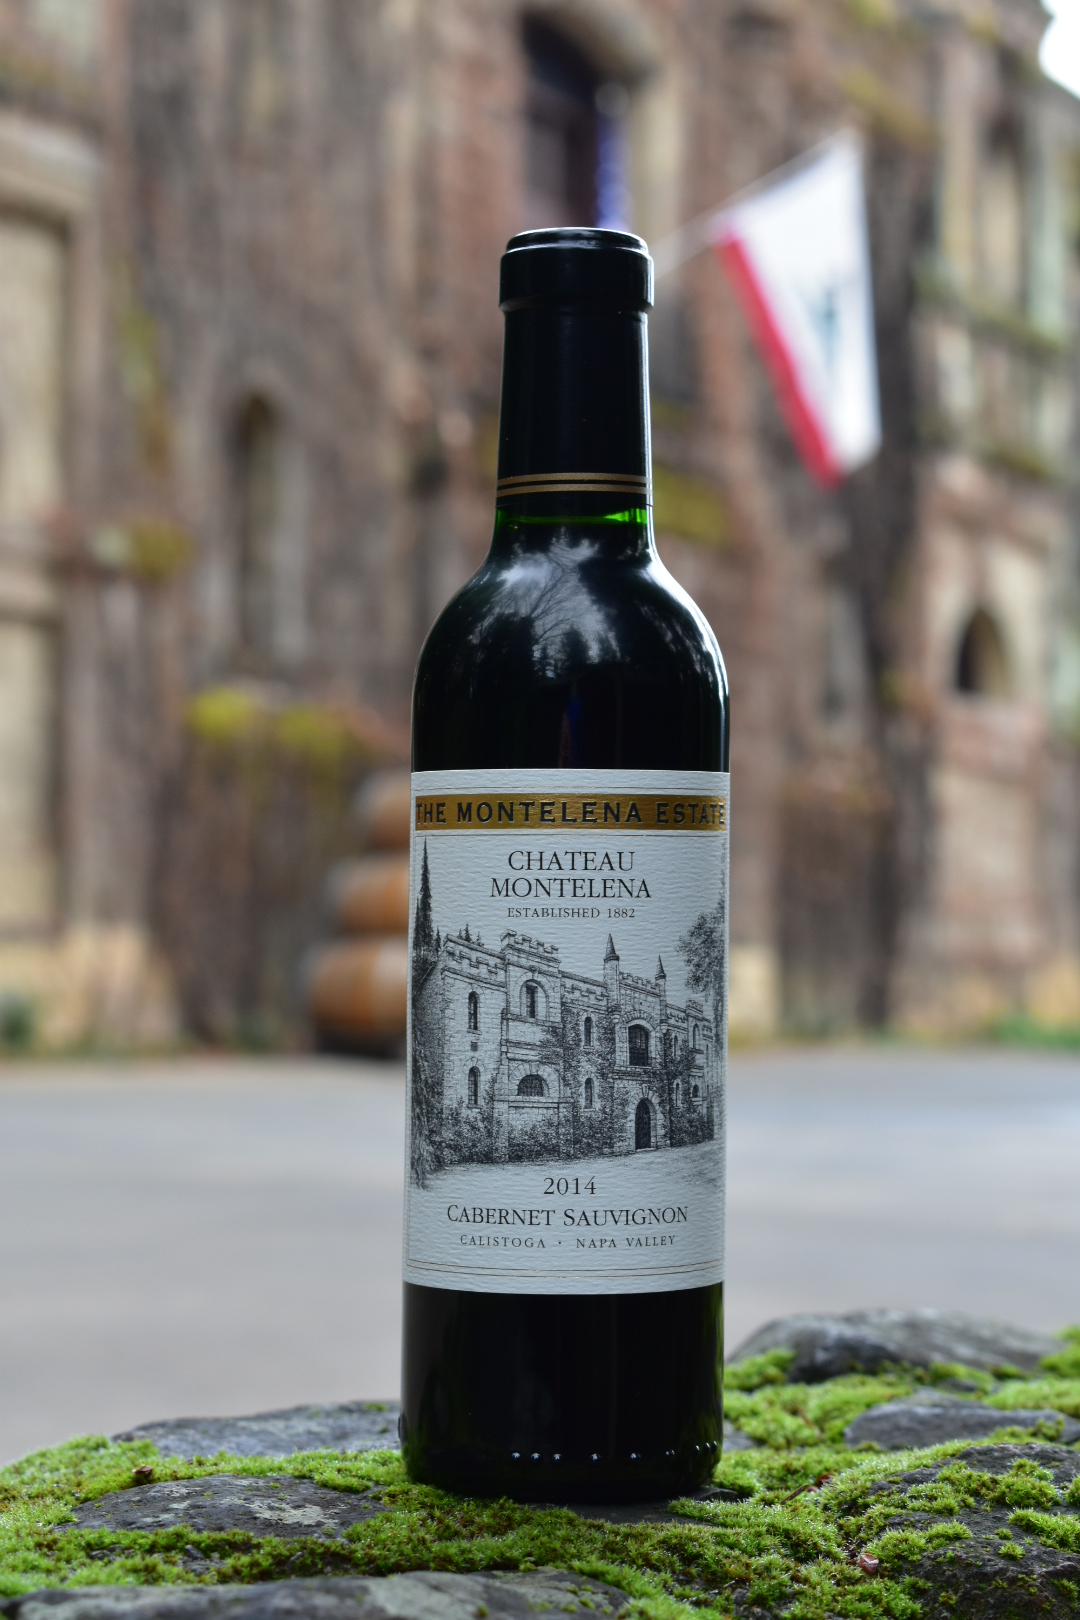 2014 Chateau Montelena Cabernet Sauvignon Calistoga